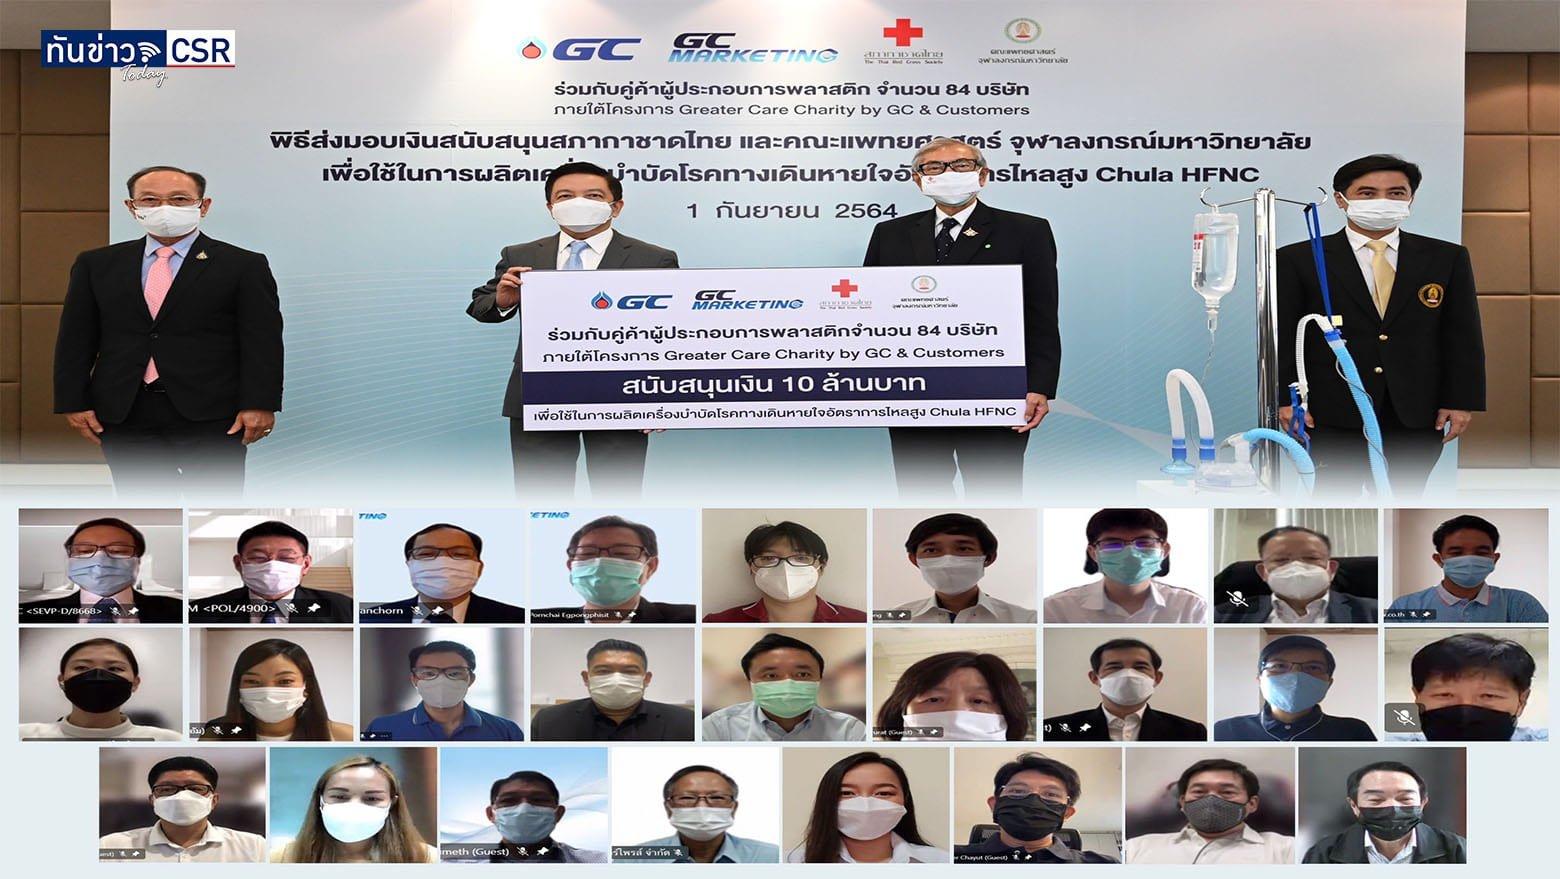 GC และ CGM ร่วมกับคู่ค้า มอบเงิน รพ.จุฬาฯ เพื่อผลิตเครื่องบำบัดโรคทางเดินหายใจอัตราการไหลสูง (Chula HFNC) ช่วยผู้ป่วยโควิด